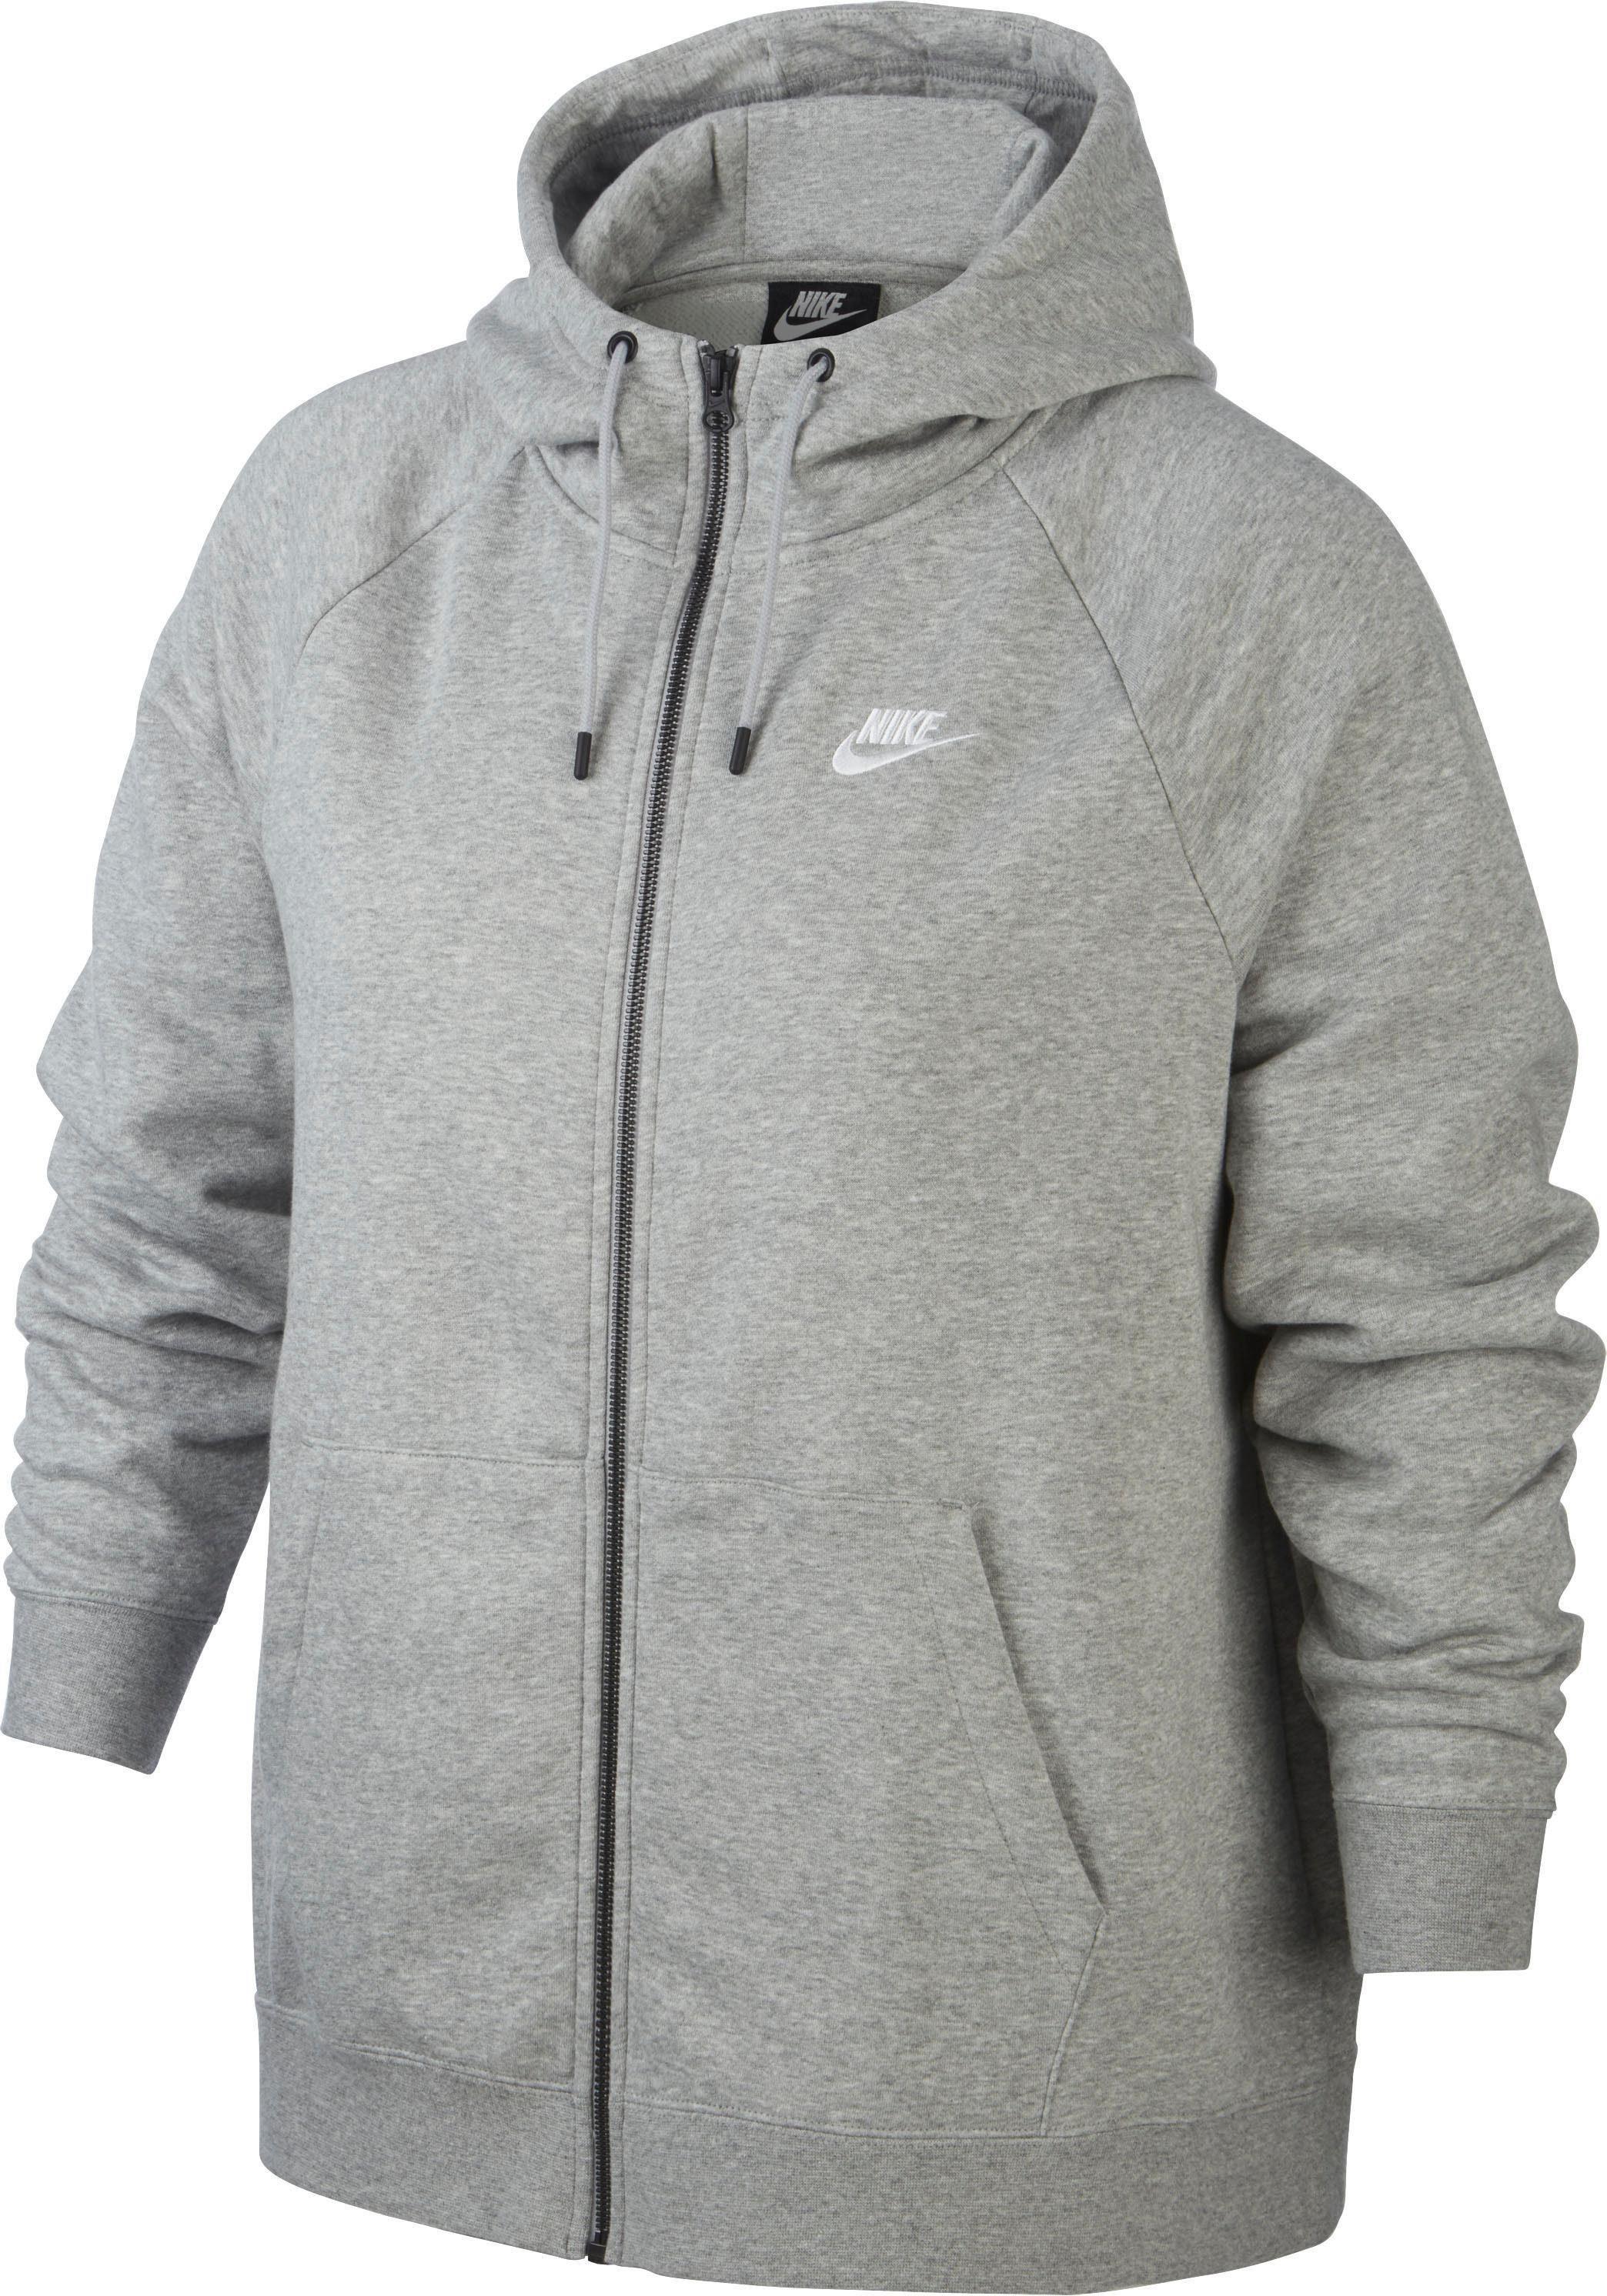 Nike Sportswear Capuchonsweatvest Essential Hoody Fullzip Fleece Plus Size Online Kopen - Geweldige Prijs